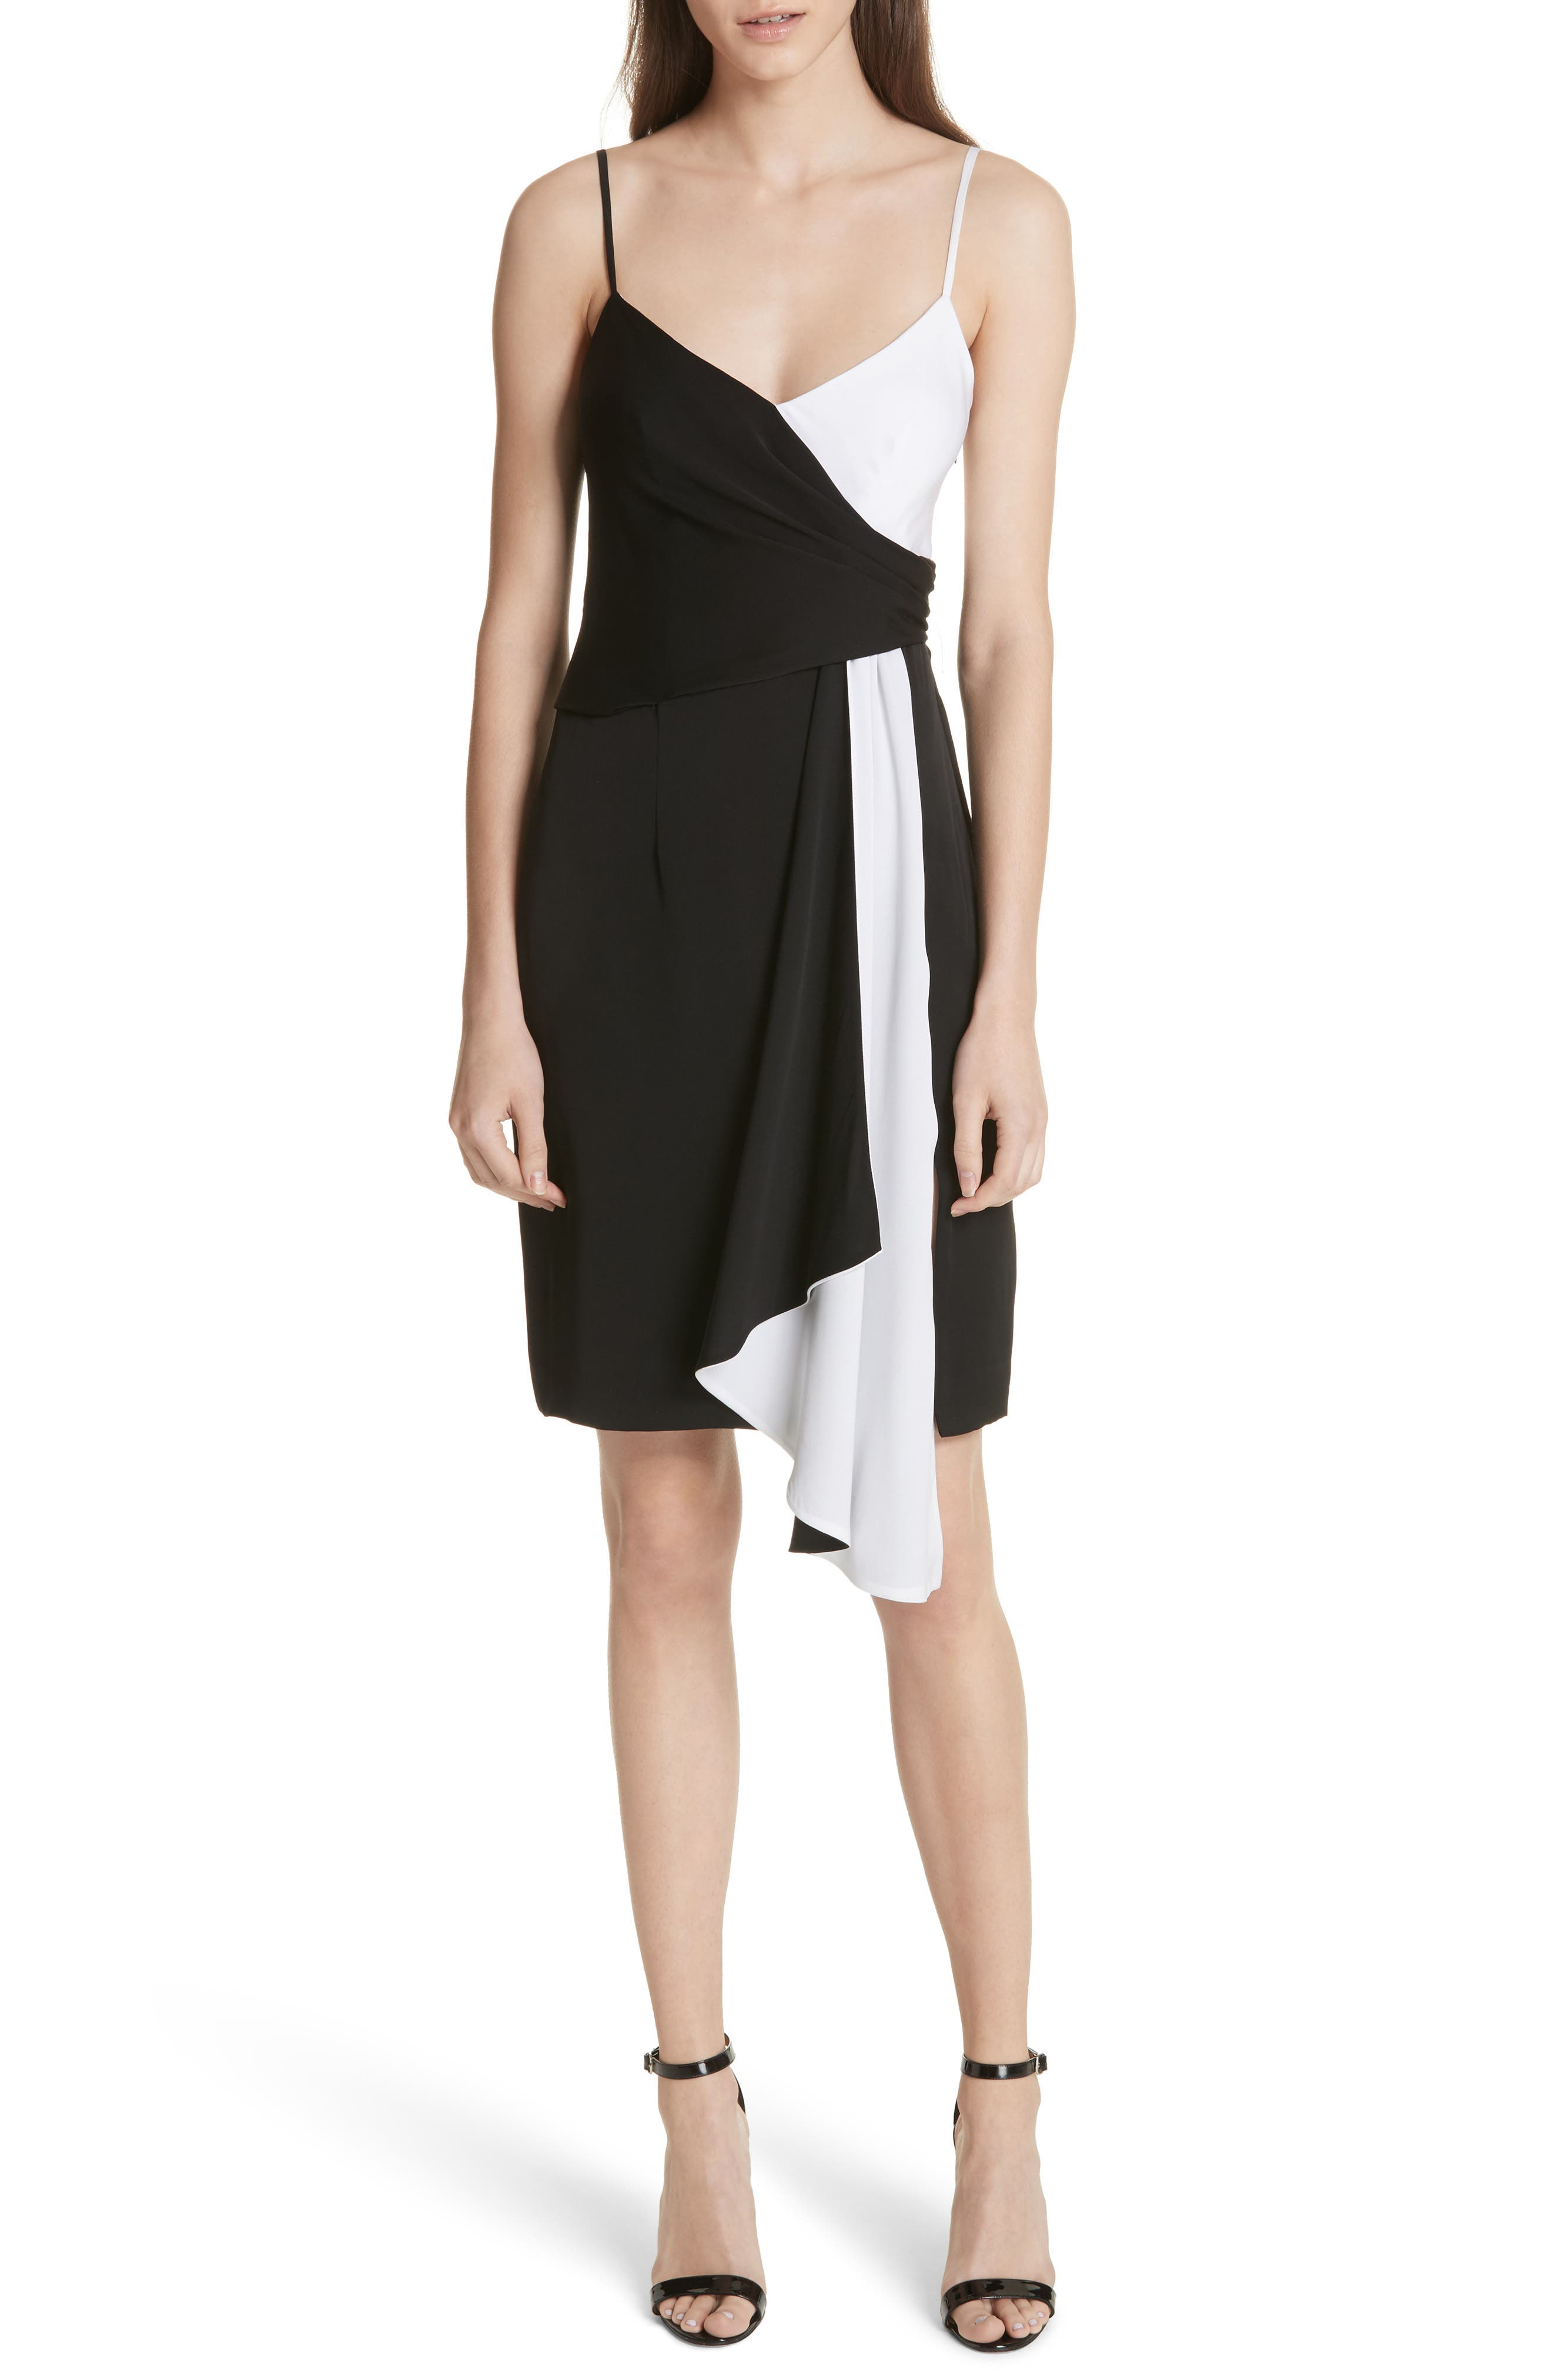 Cindy Two-Tone Stretch Silk Dress,                         Main,                         color, Black/ White